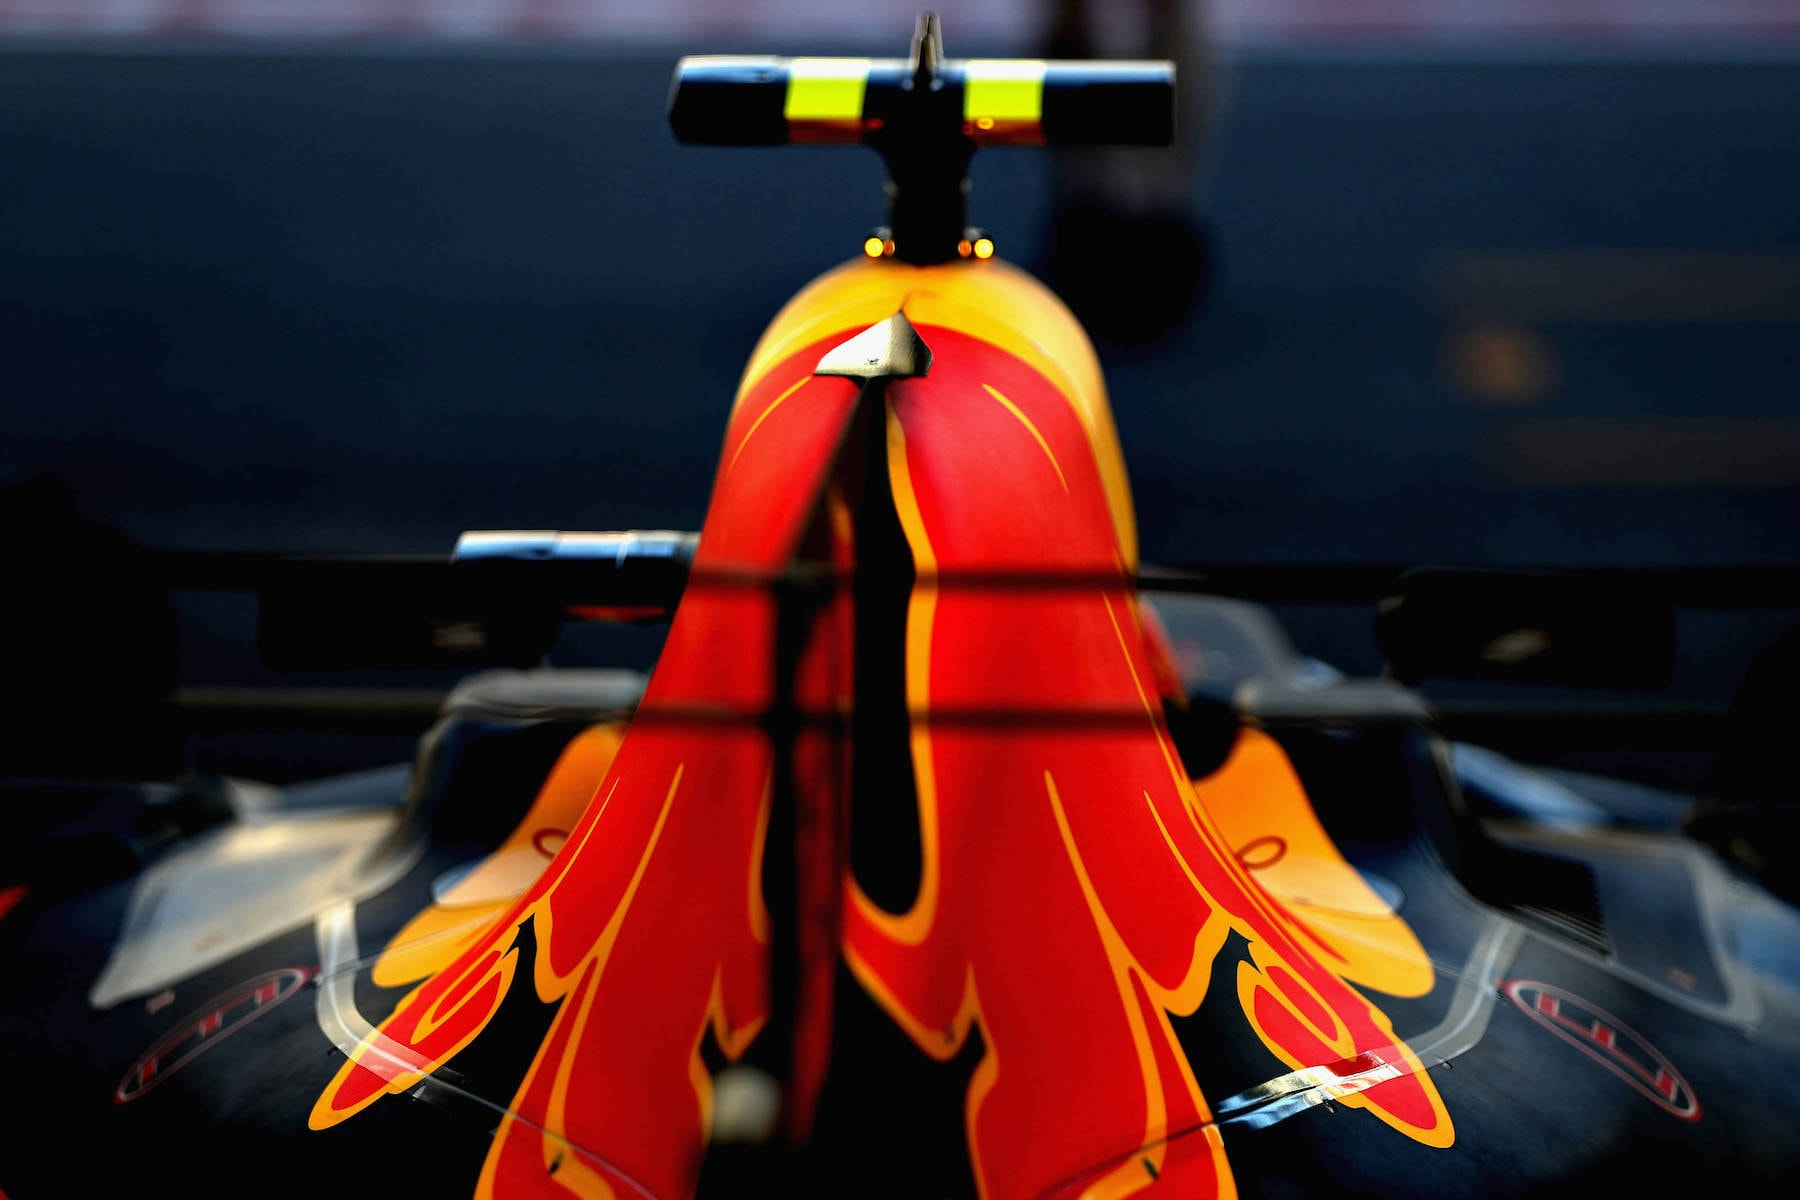 2017 Max Verstappen | Red Bull RB13 | 2017 Azerbaijan GP Q3 P4 1 copy.jpg